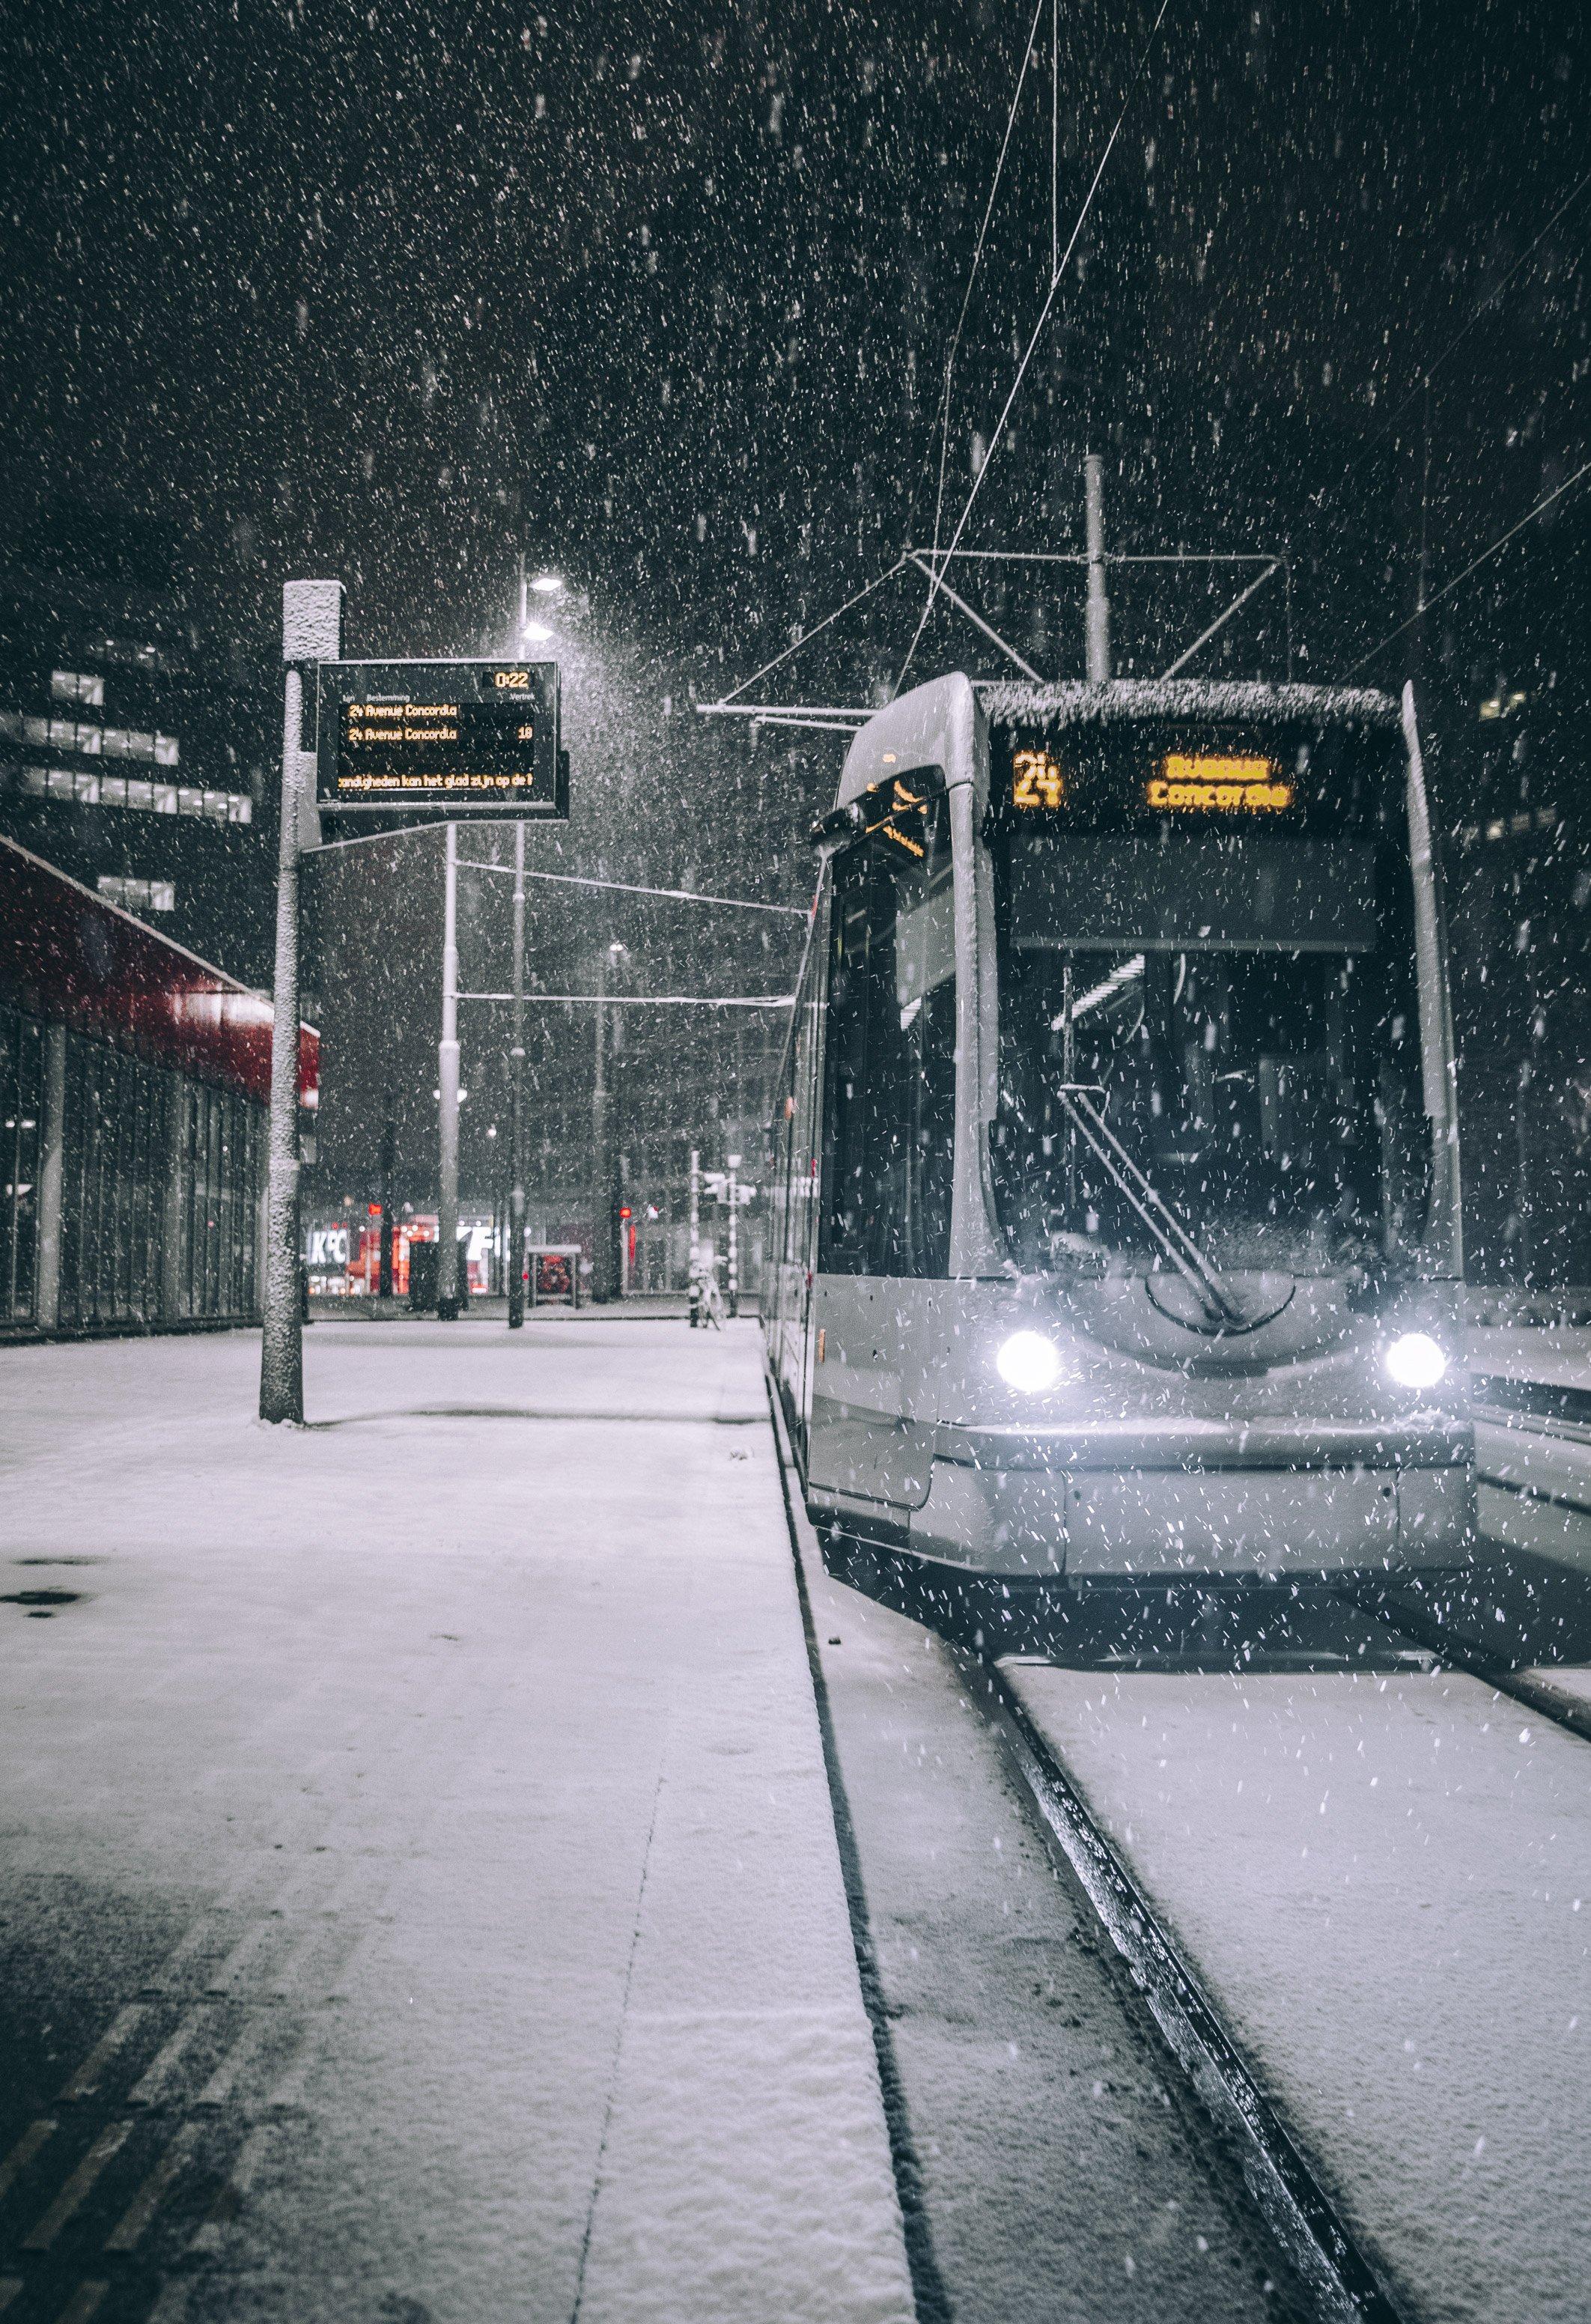 Snowy night Rotterdam Marconiplein